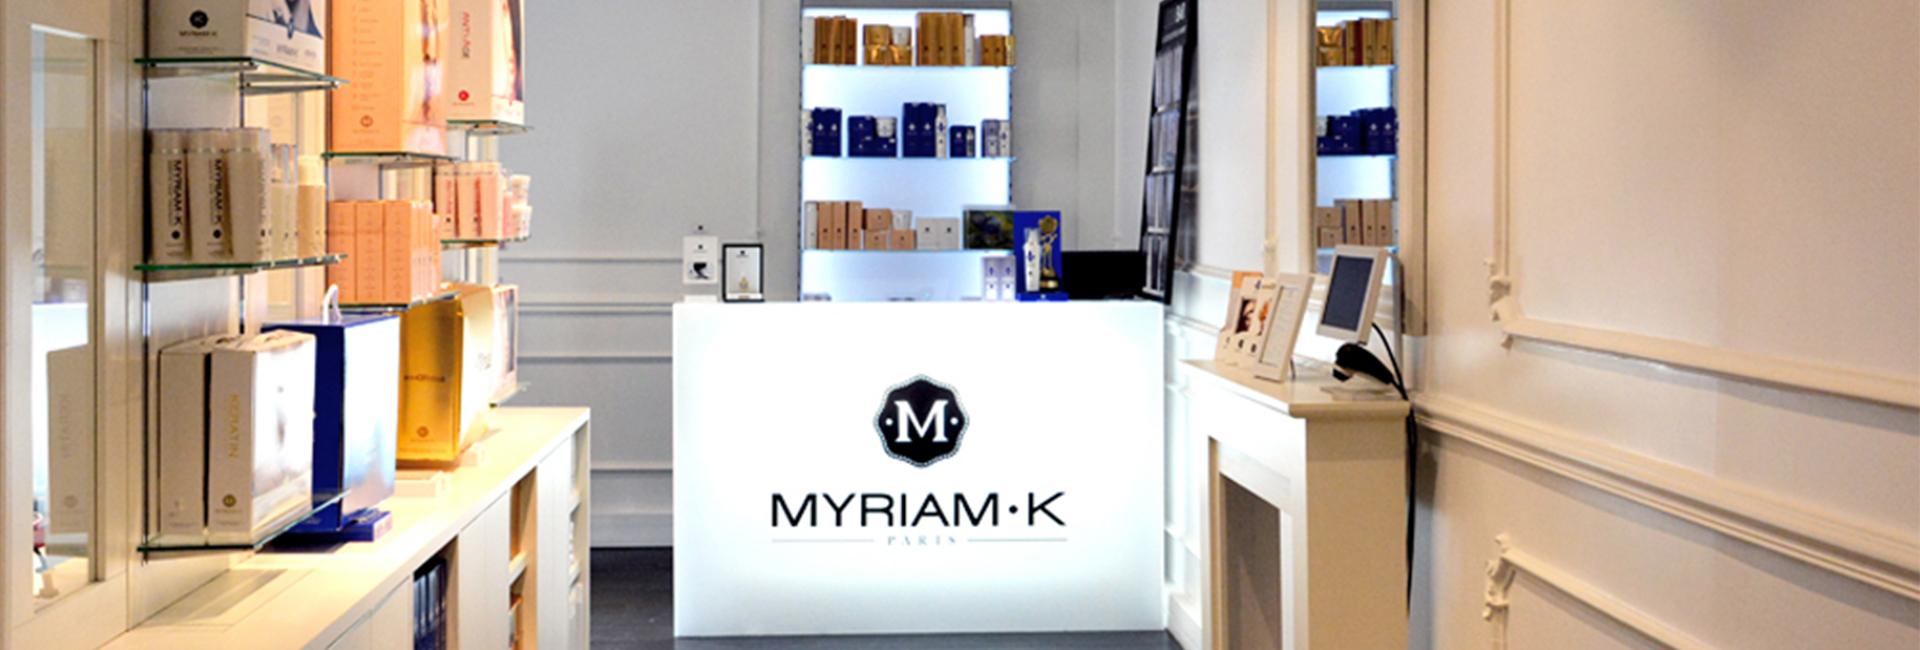 showroom-myriam-k-lissage-francais-blog-beaute-soin-parfum-homme-1